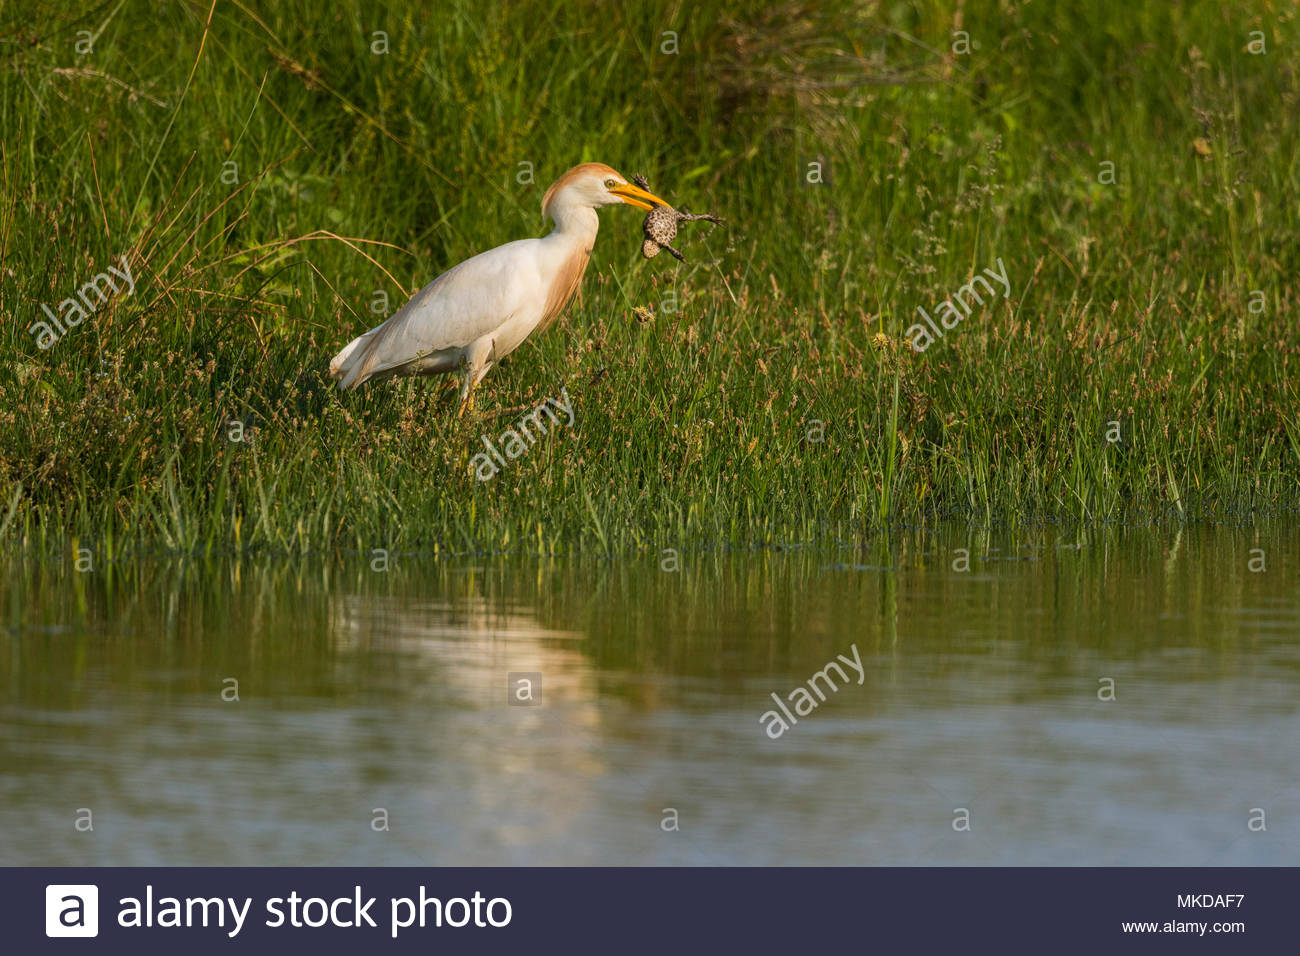 Western Cattle Egret (Bubulcus ibis) with a large Toad, Ler Crotoy, Baie de Somme, Hauts-de-France, France. - Stock Image